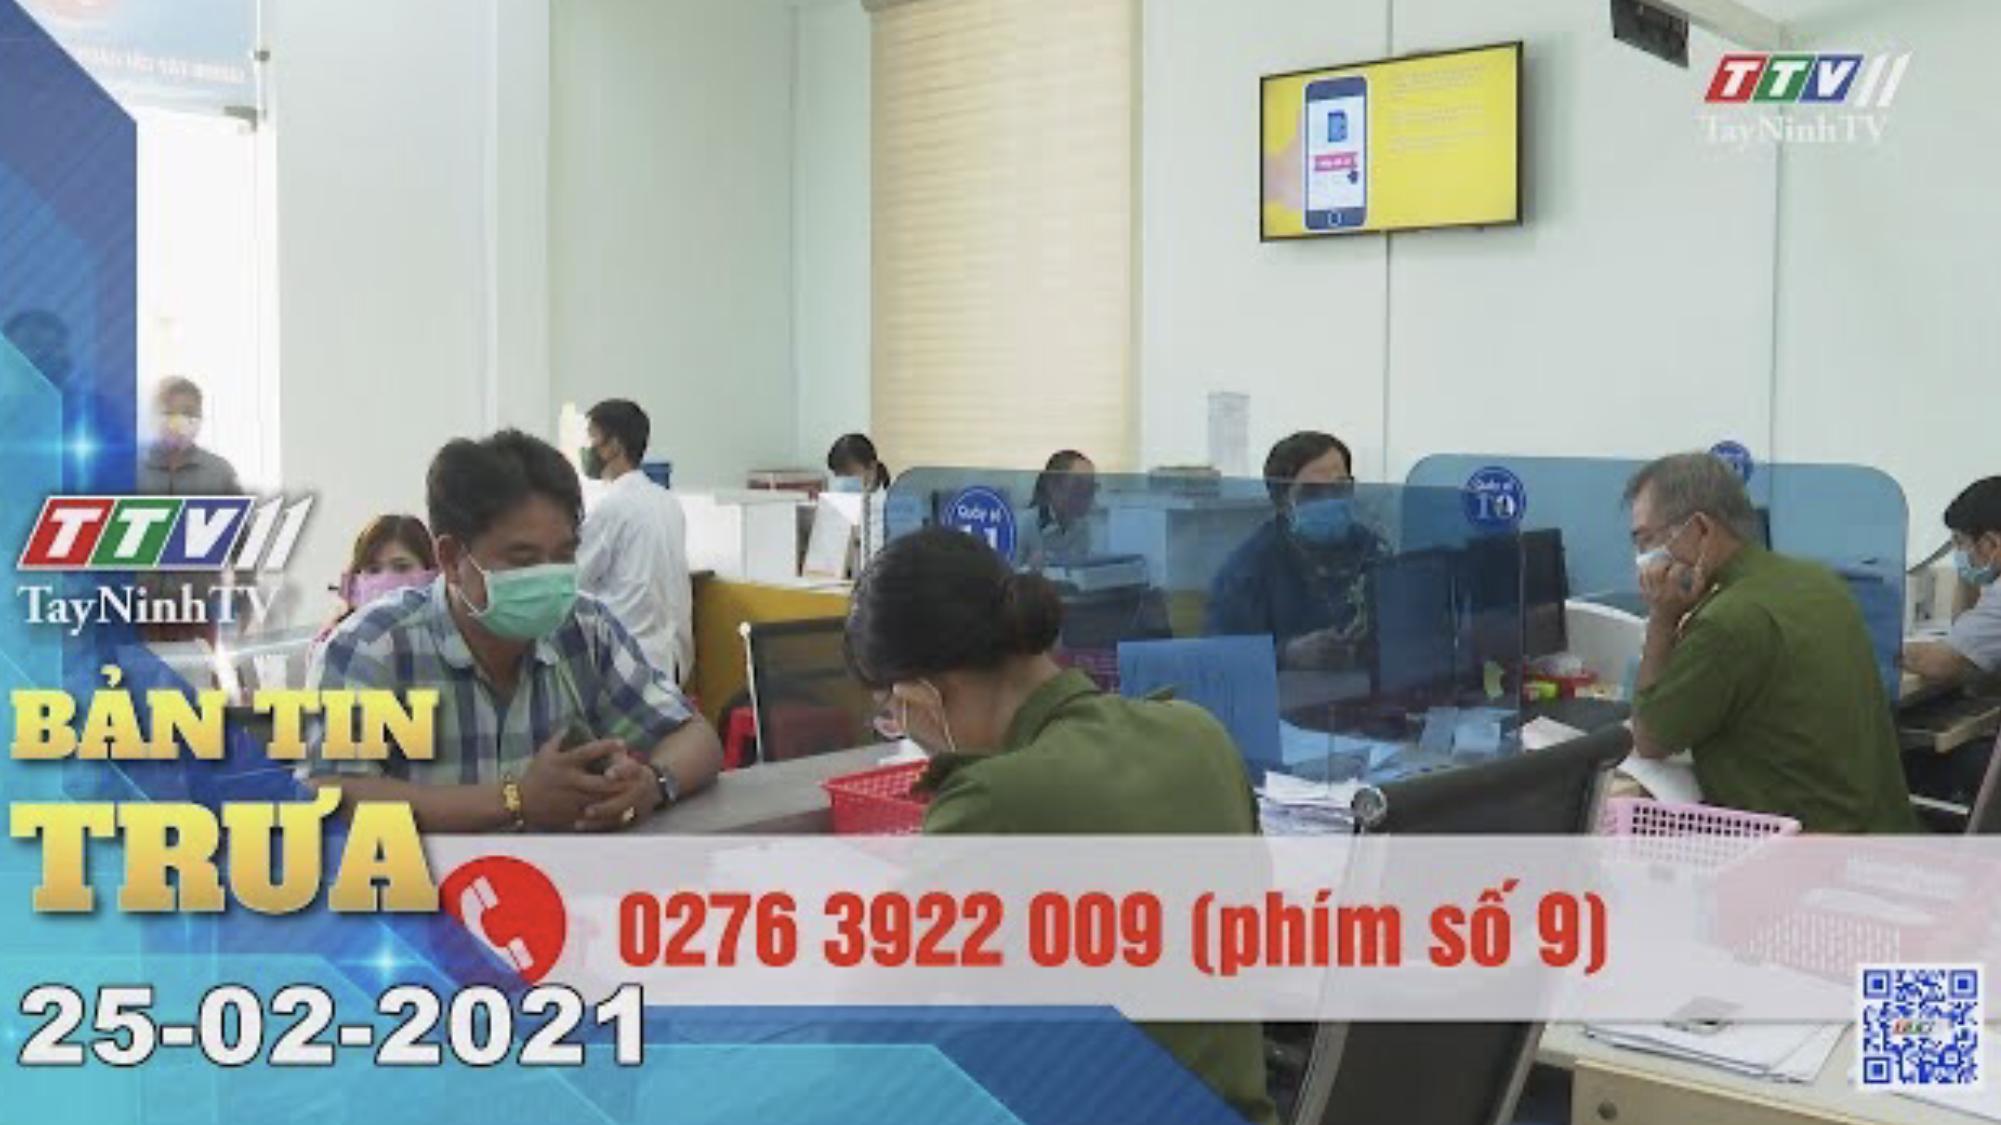 Bản tin trưa 25-02-2021 | Tin tức hôm nay | TayNinhTV